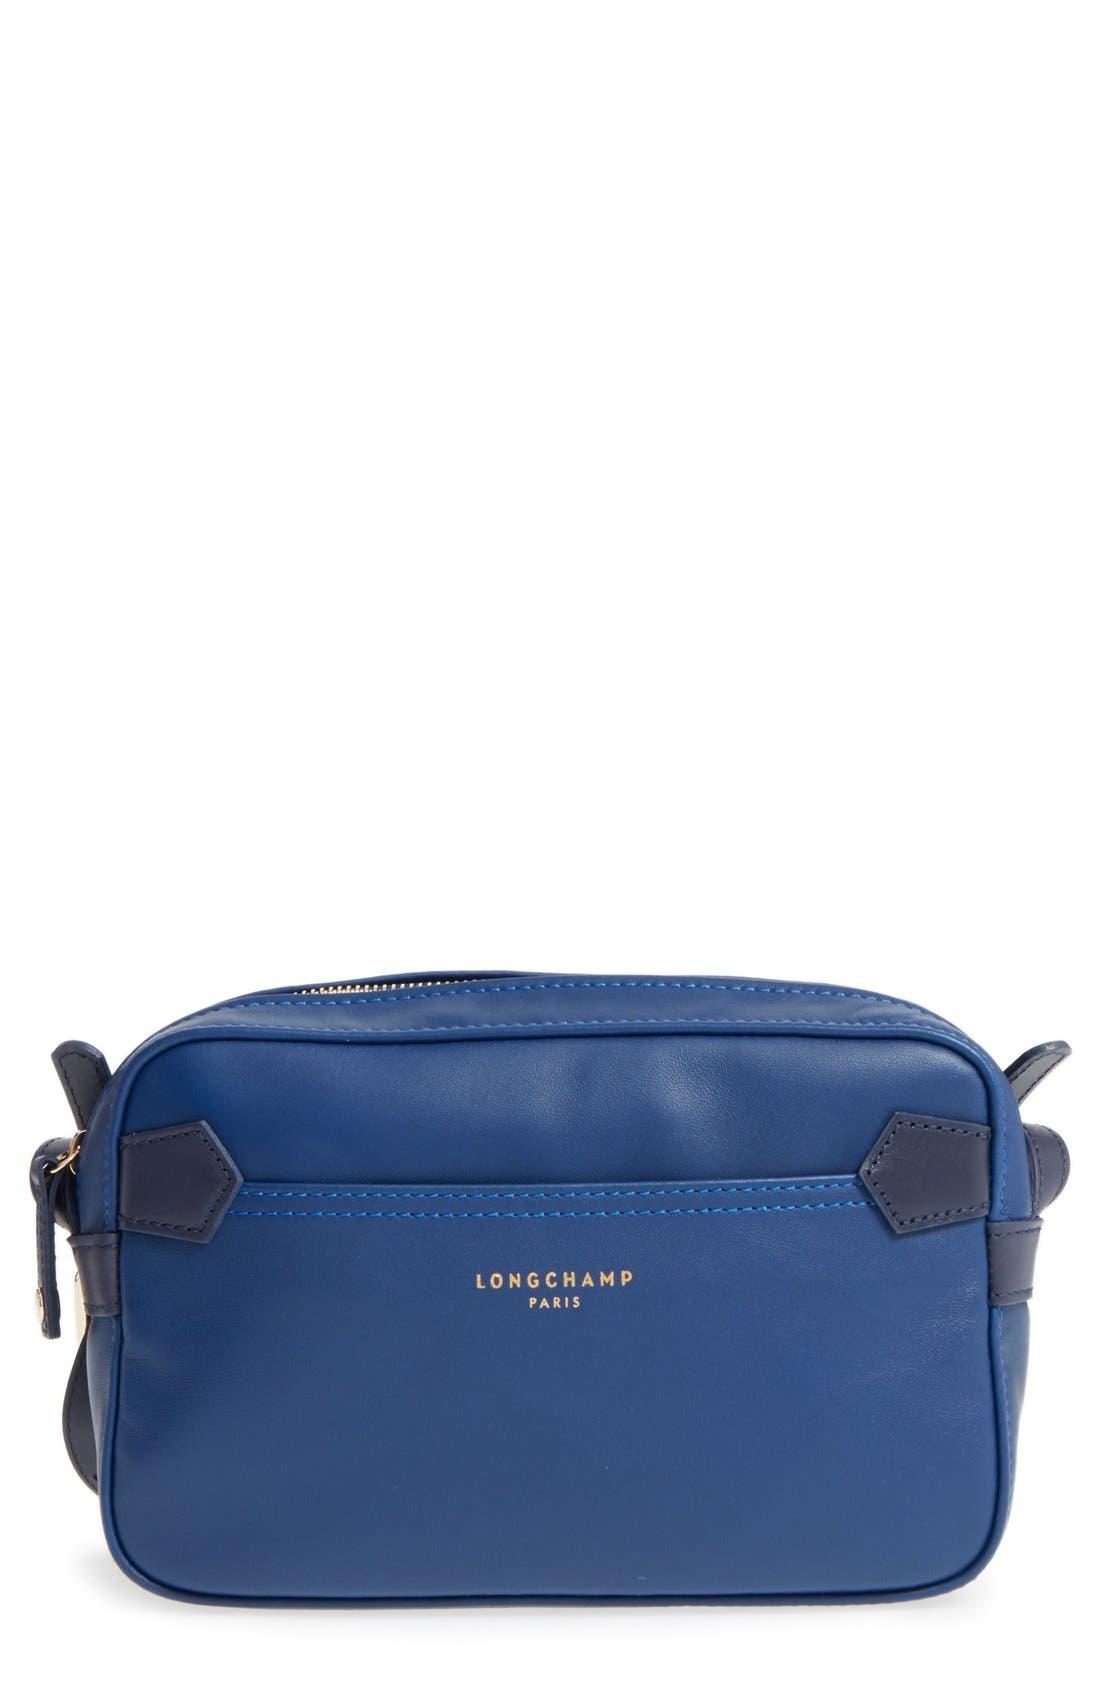 Alternate Image 1 Selected - Longchamp '2.0' Two-Tone Leather Crossbody Bag